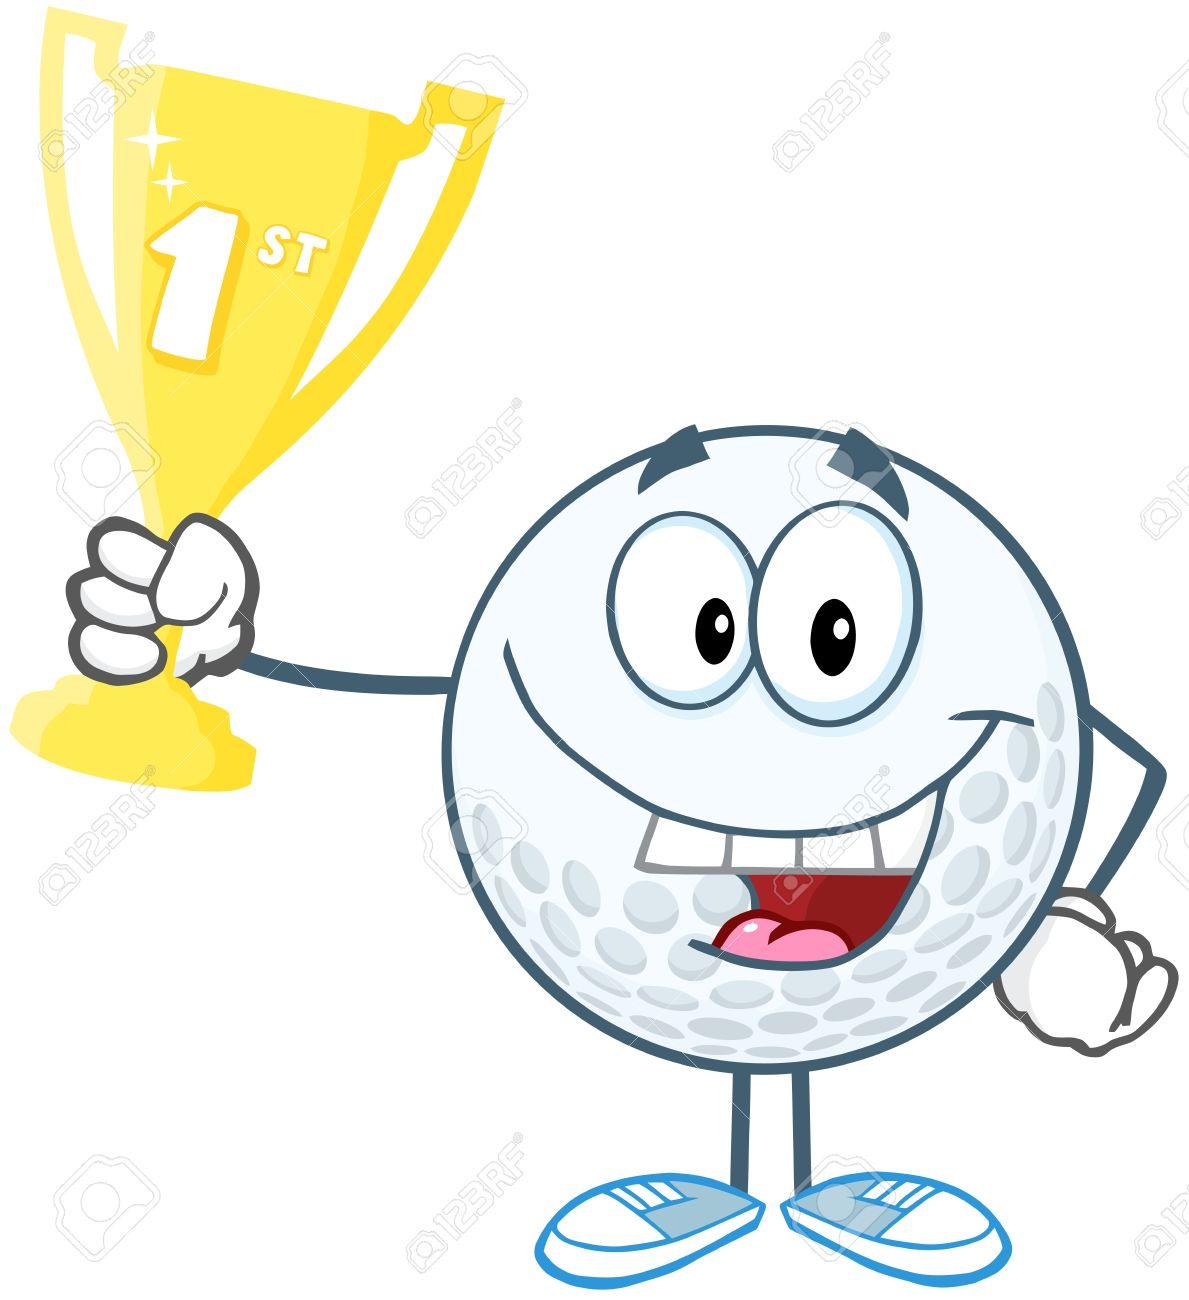 1189x1300 Golf Winner Clipart Amp Golf Winner Clip Art Images